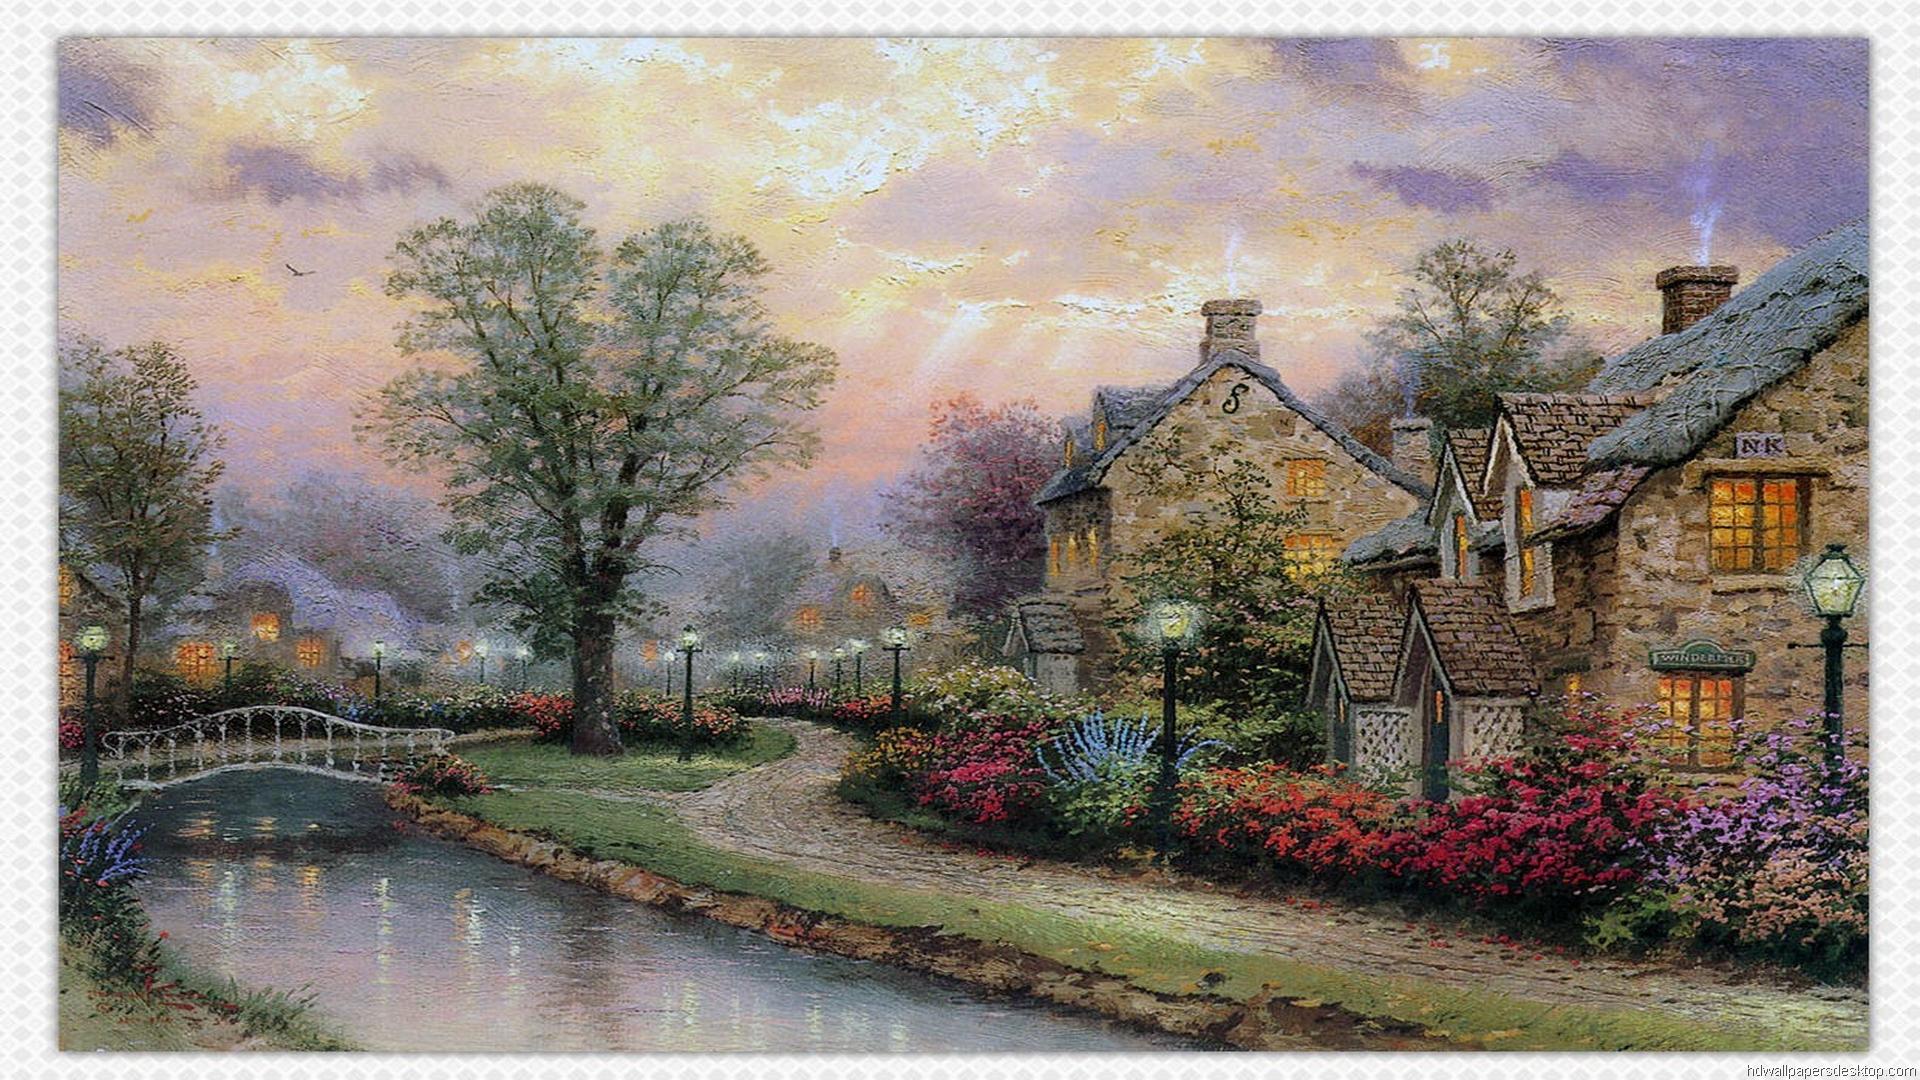 Thomas Kinkade Wallpaper And Screensavers Wallpapersafari